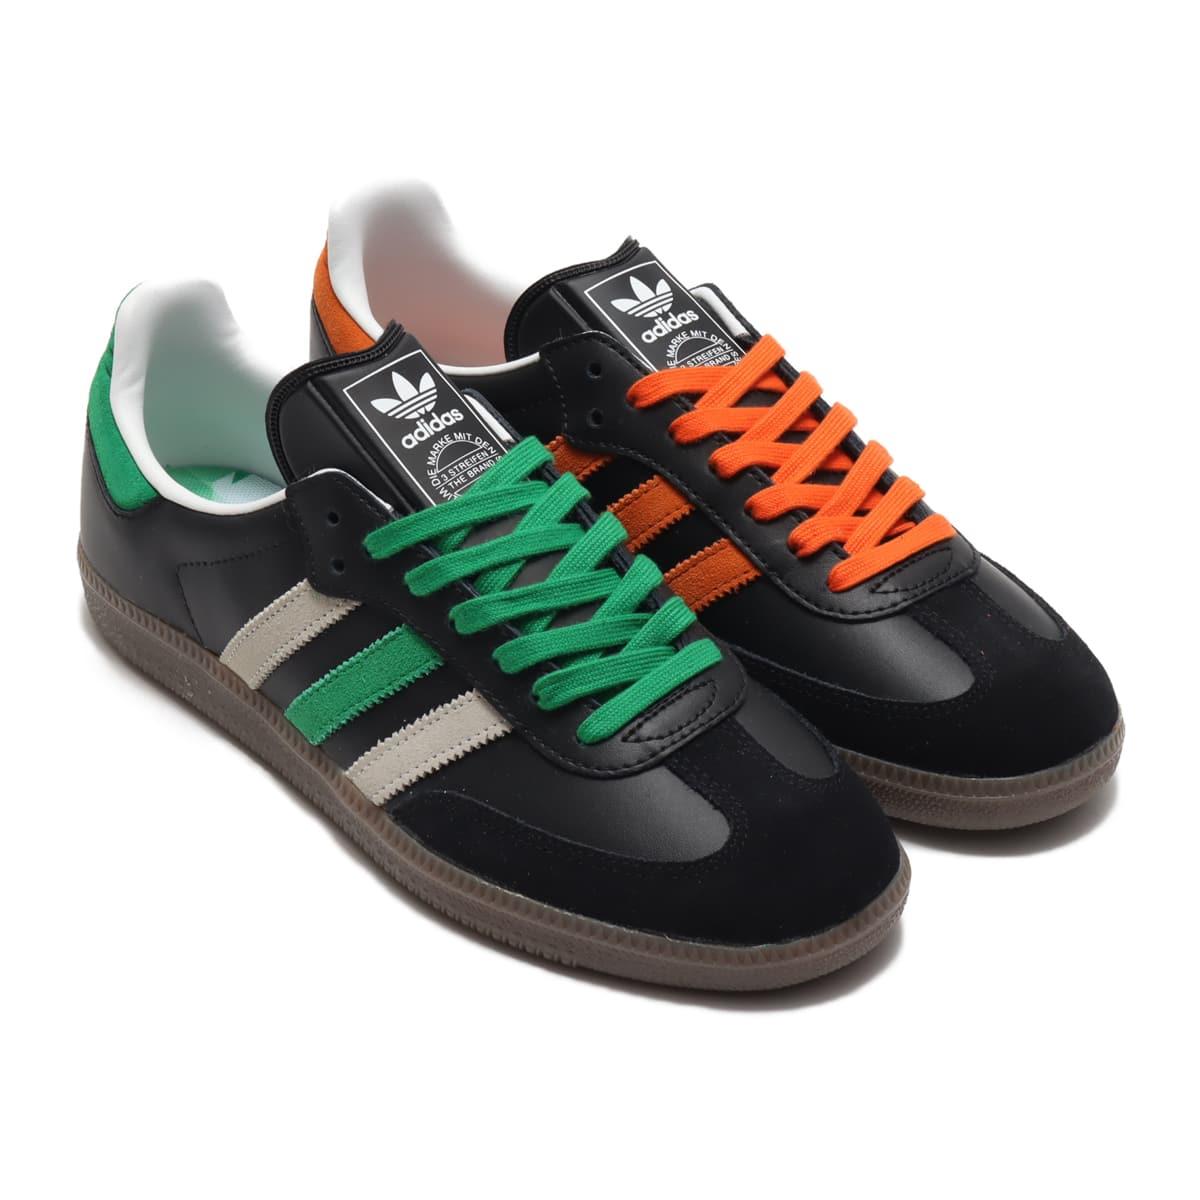 adidas SAMBA CORE BLACK/ORANGE/FOOTWEAR